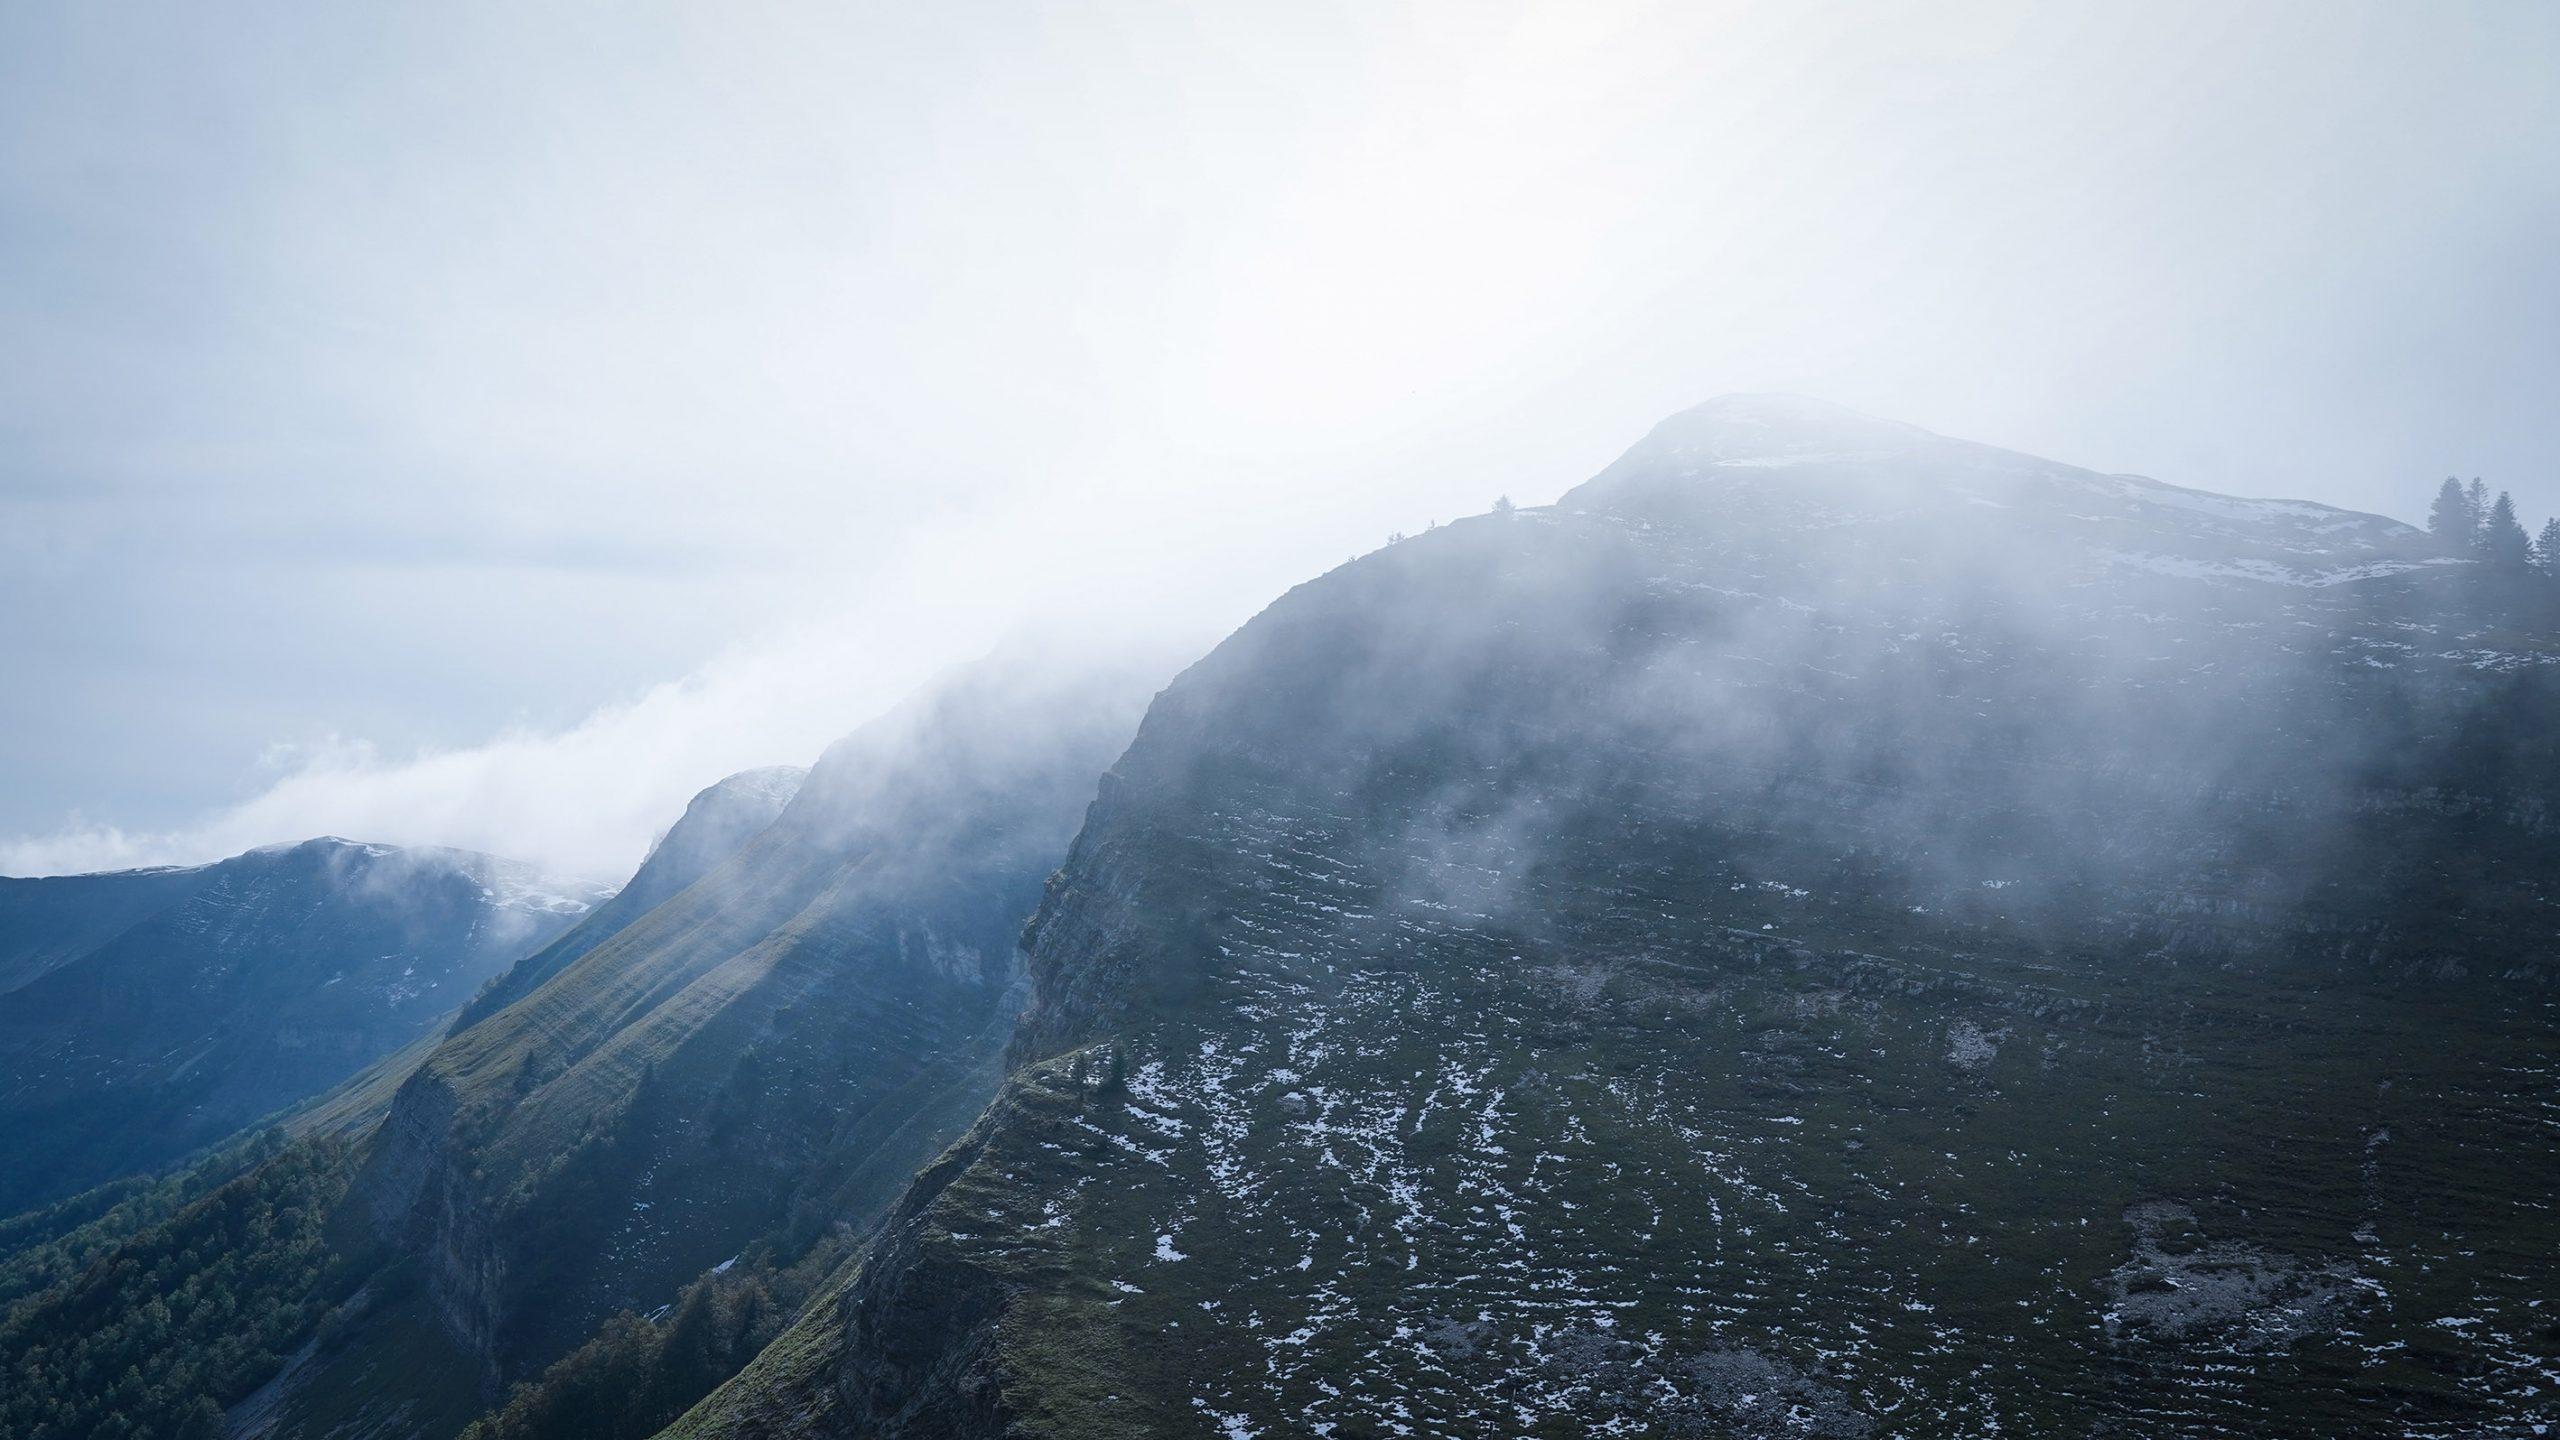 montagnes Grand Mont-Rond brume sapins neige Jura